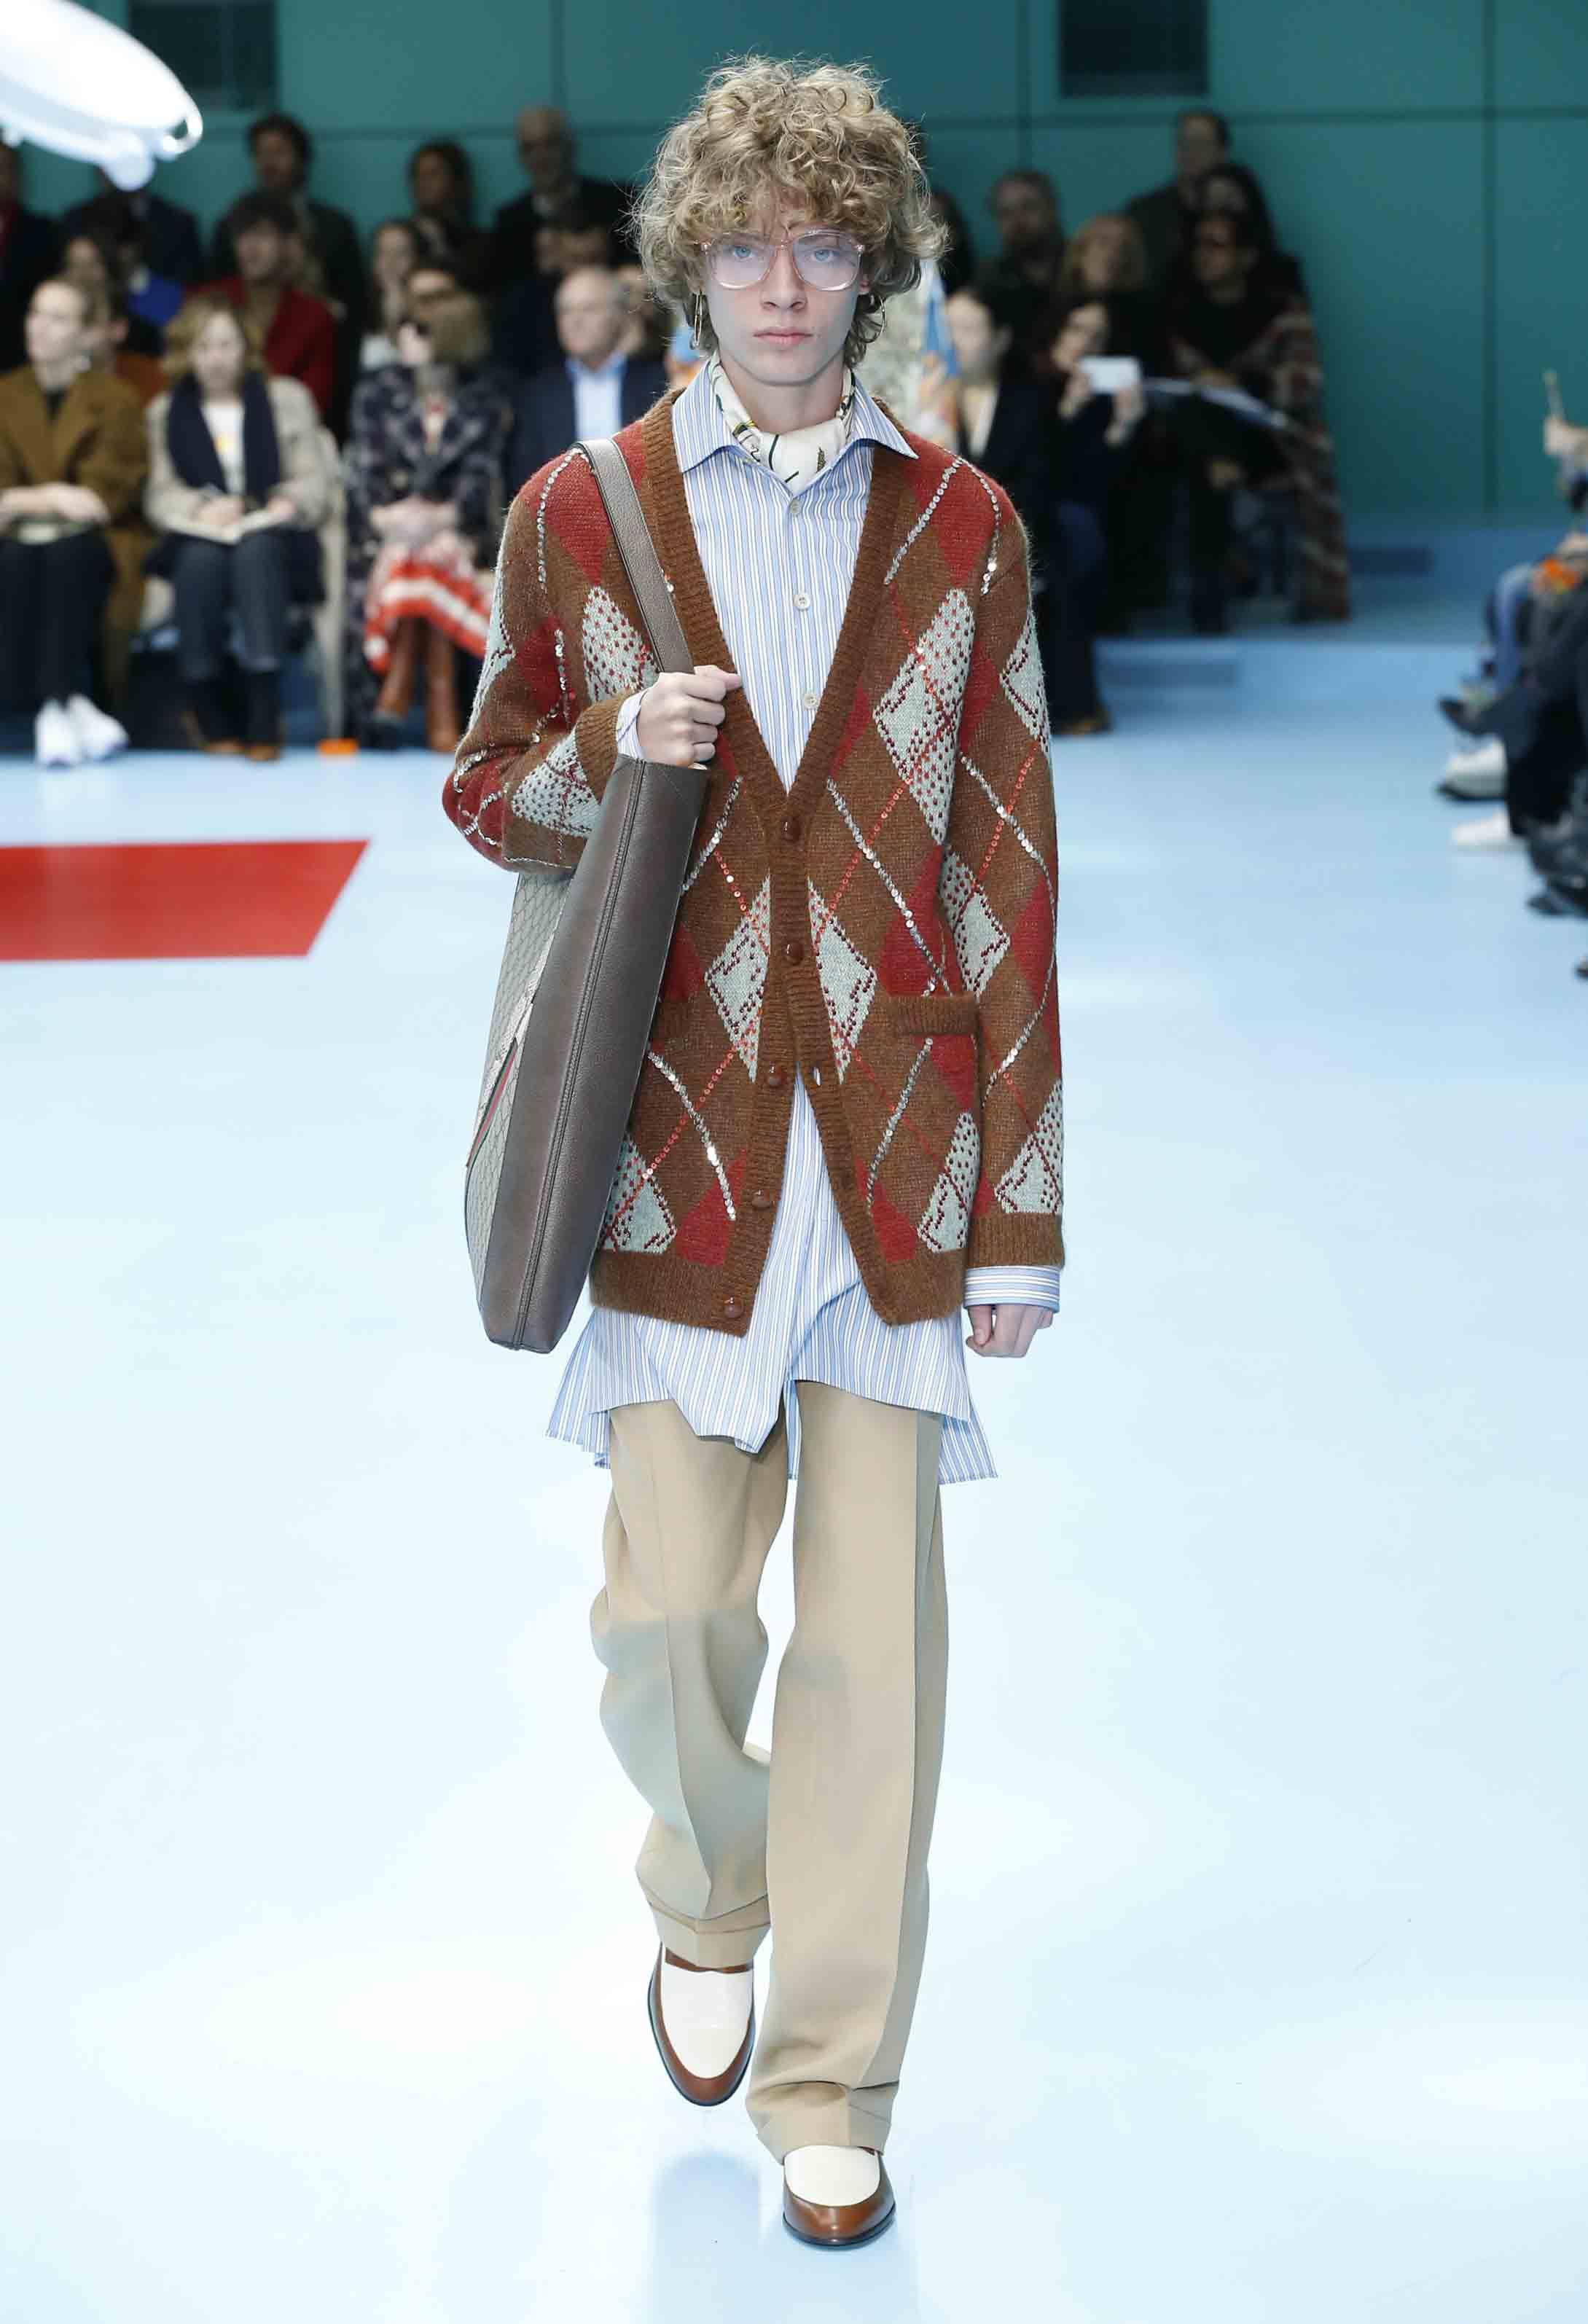 Gucci fall winter 2018 2019 fashion show Mla winter style fashion set